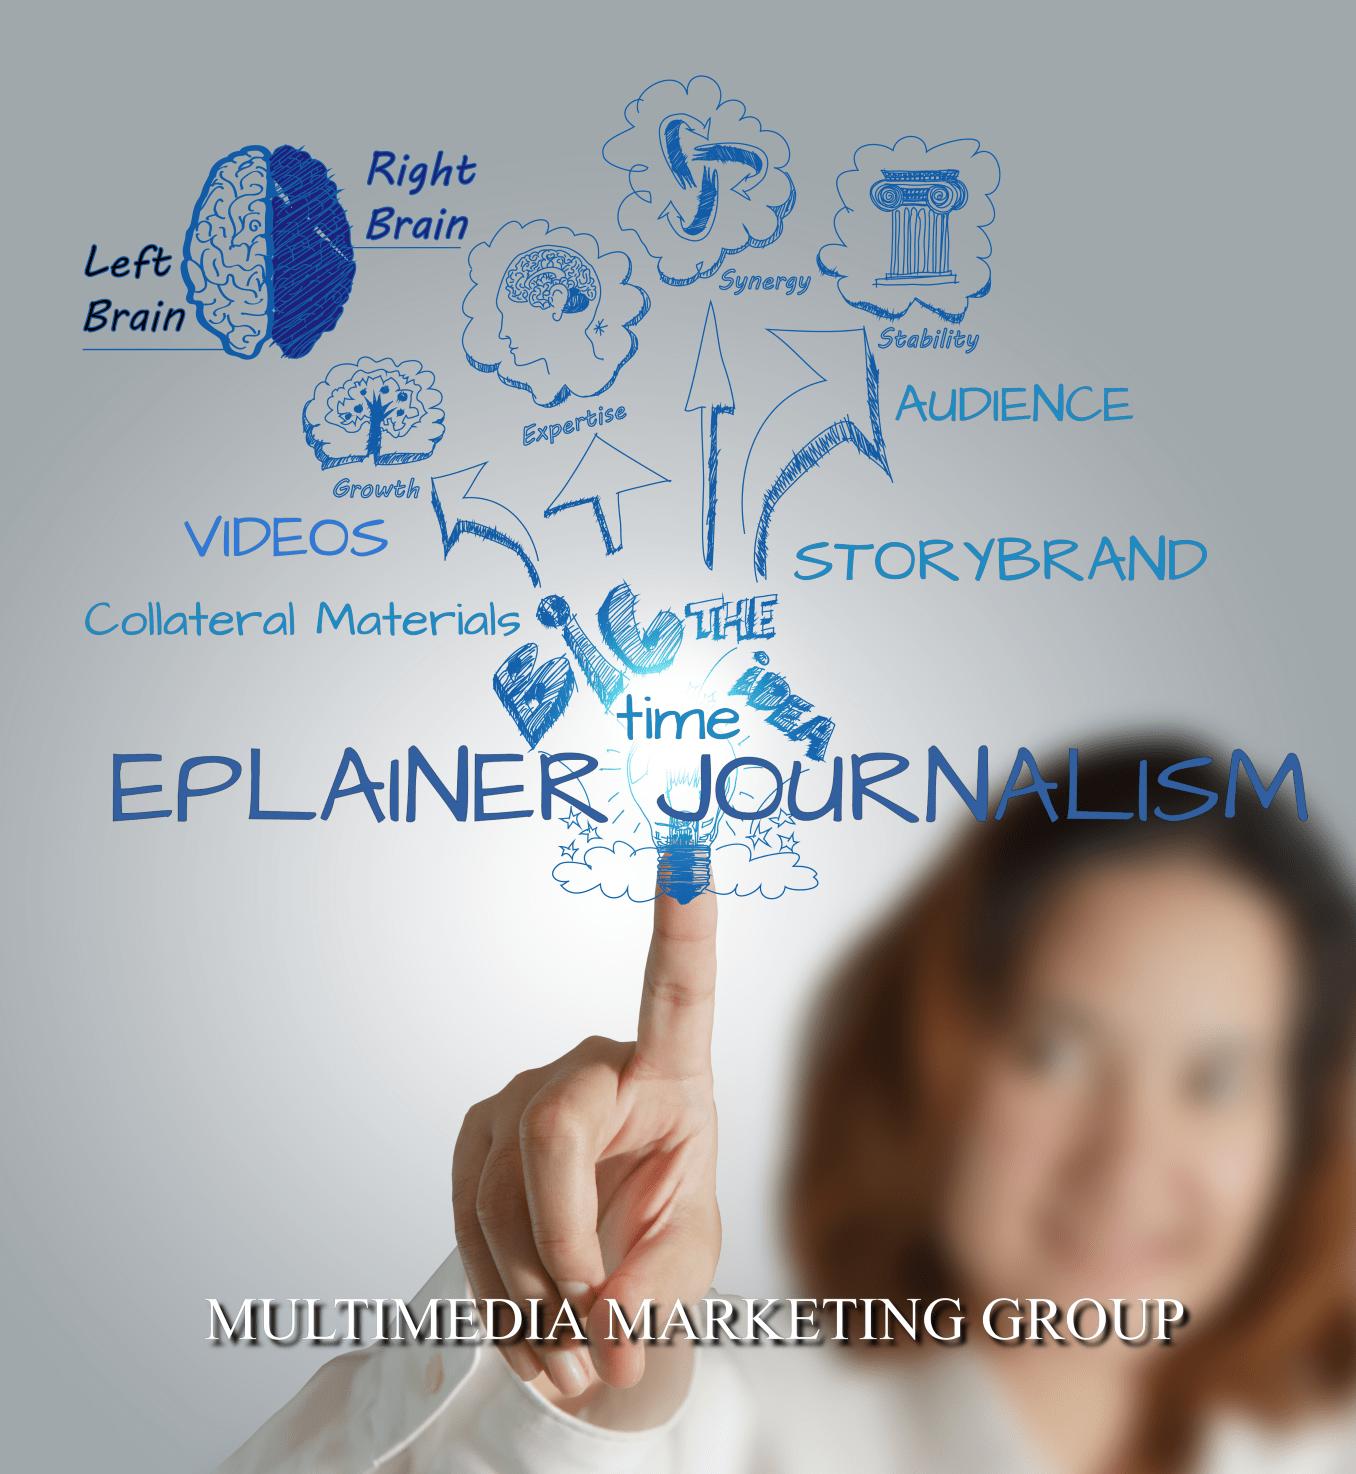 Explainer Journalism